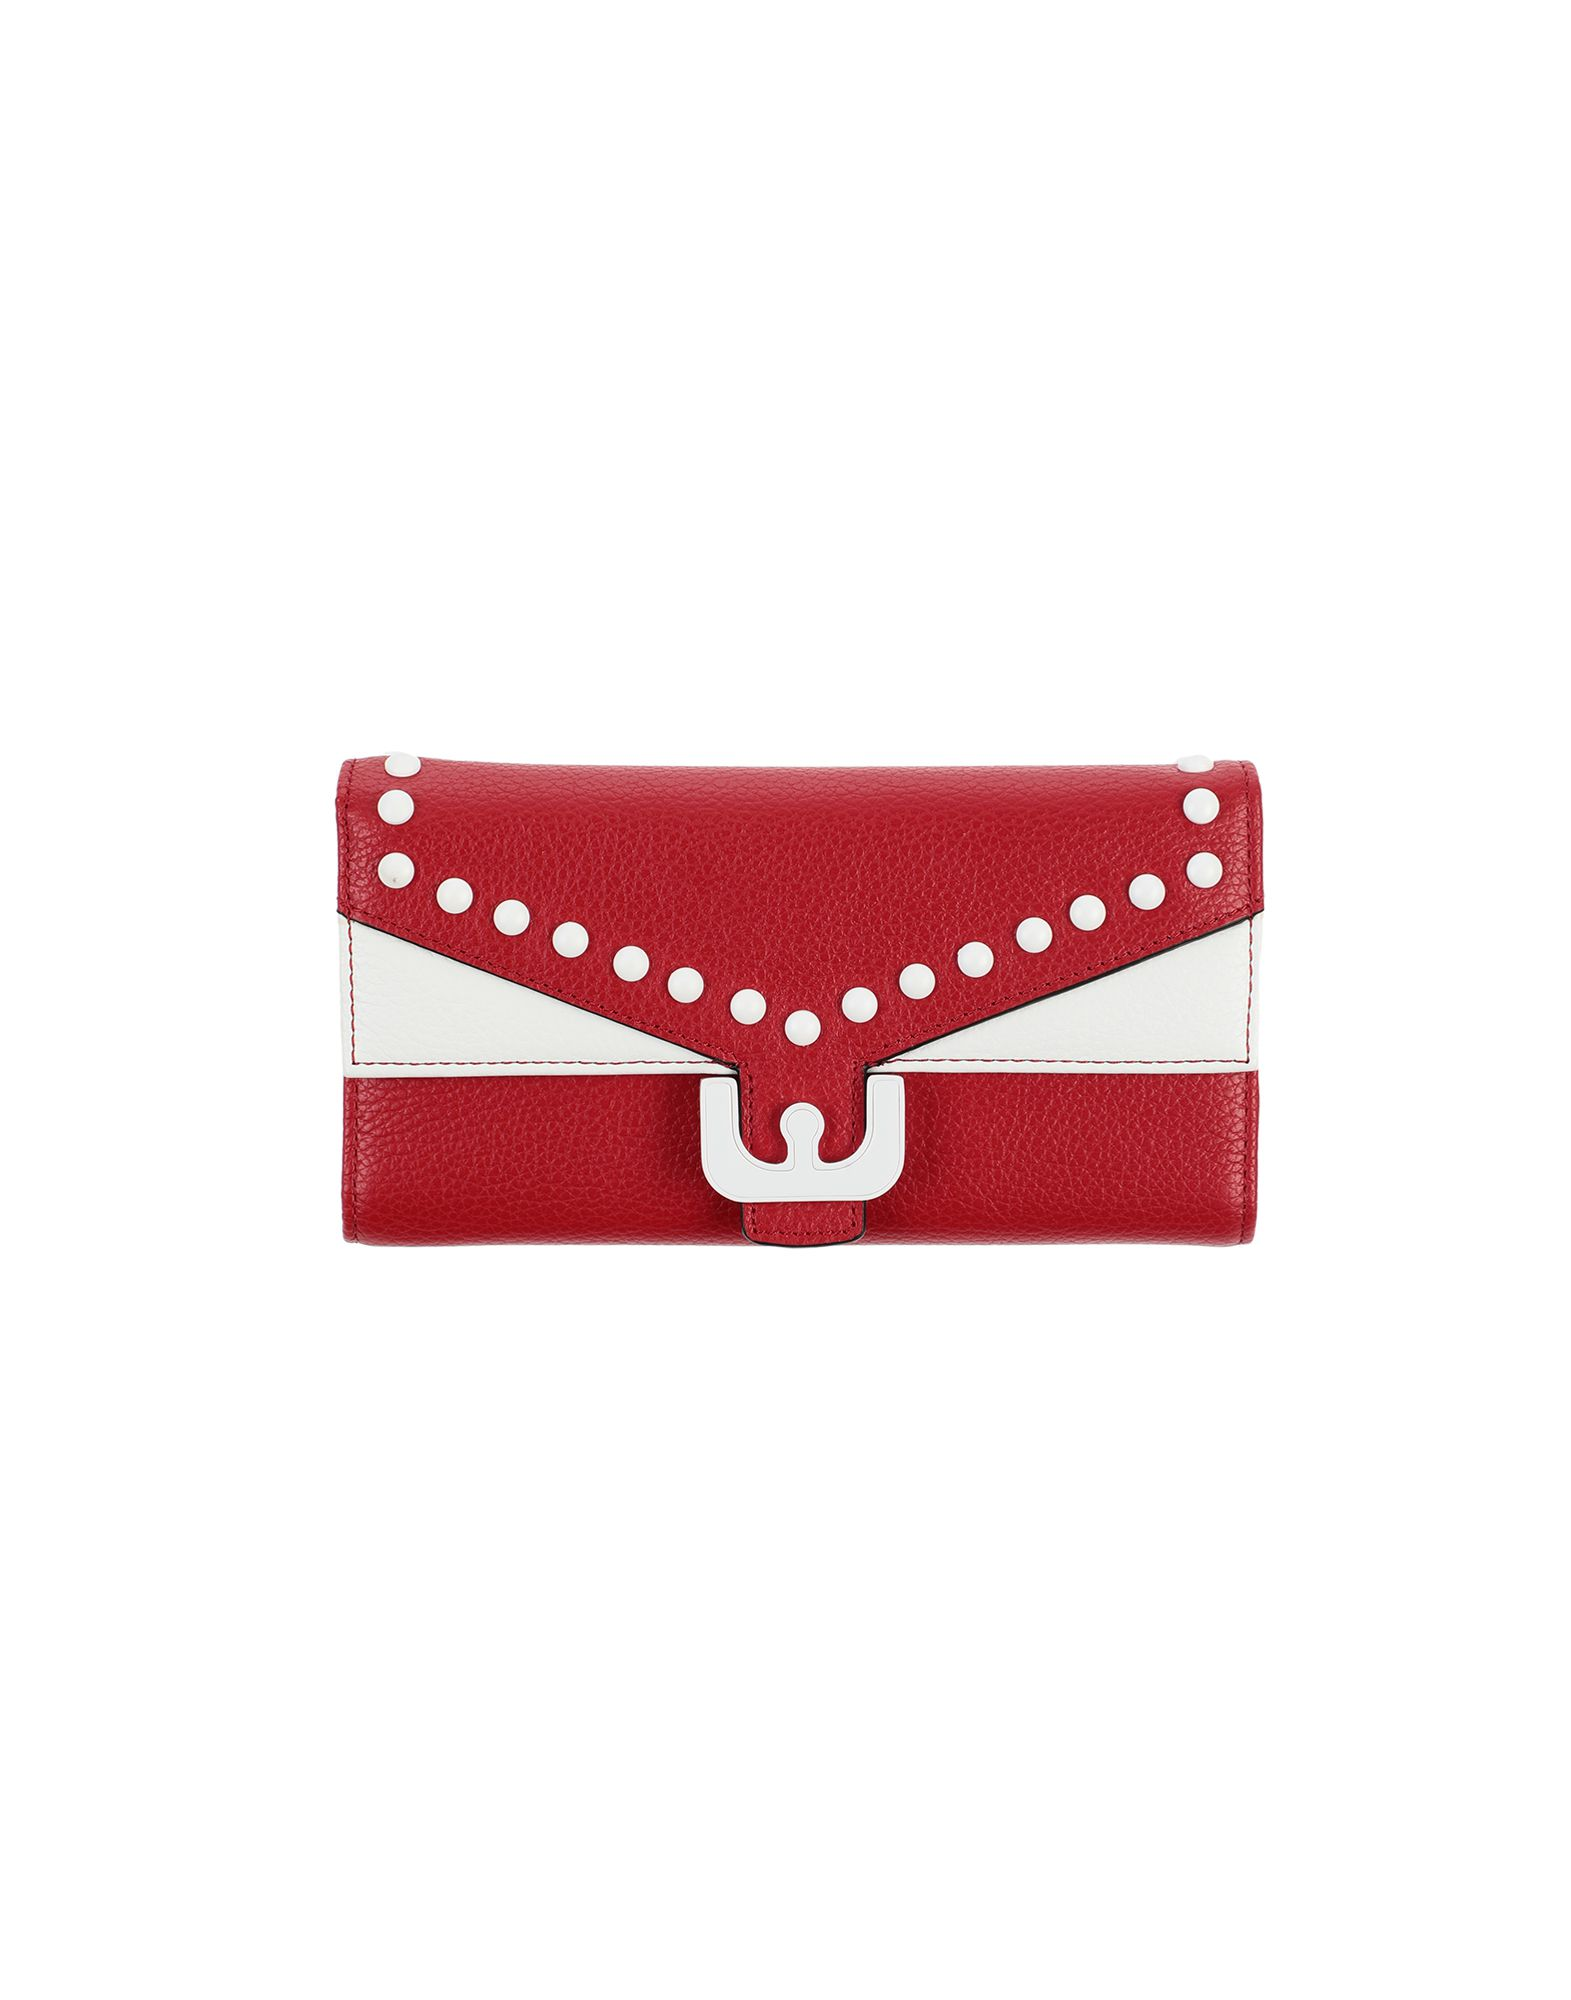 COCCINELLE Бумажник рюкзак coccinelle c1 yo5 14 01 01 012